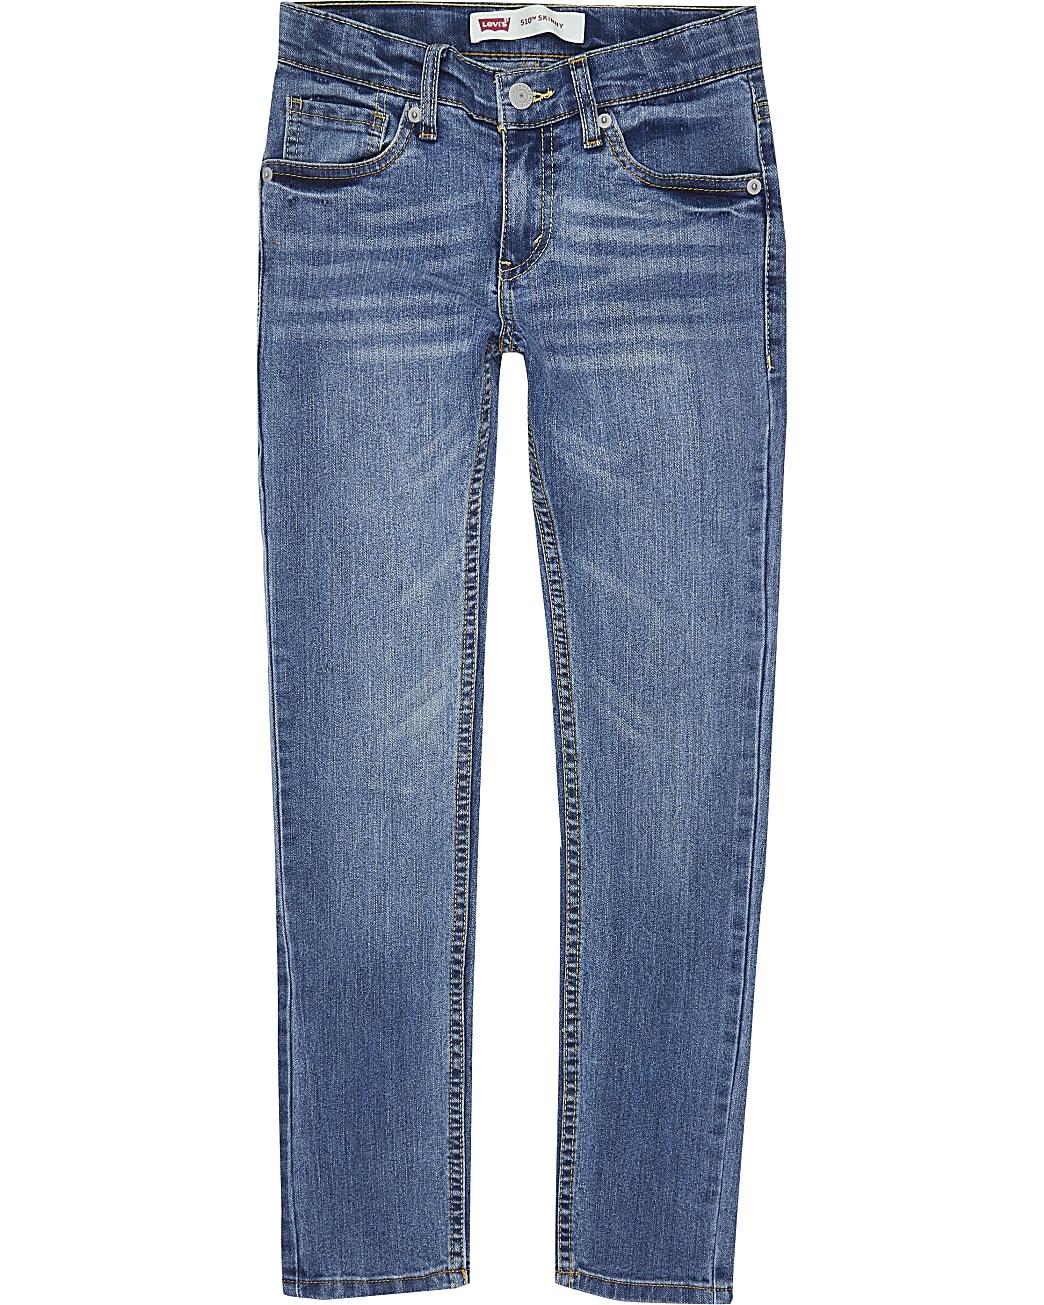 Boys blue Levi's skinny fit jeans